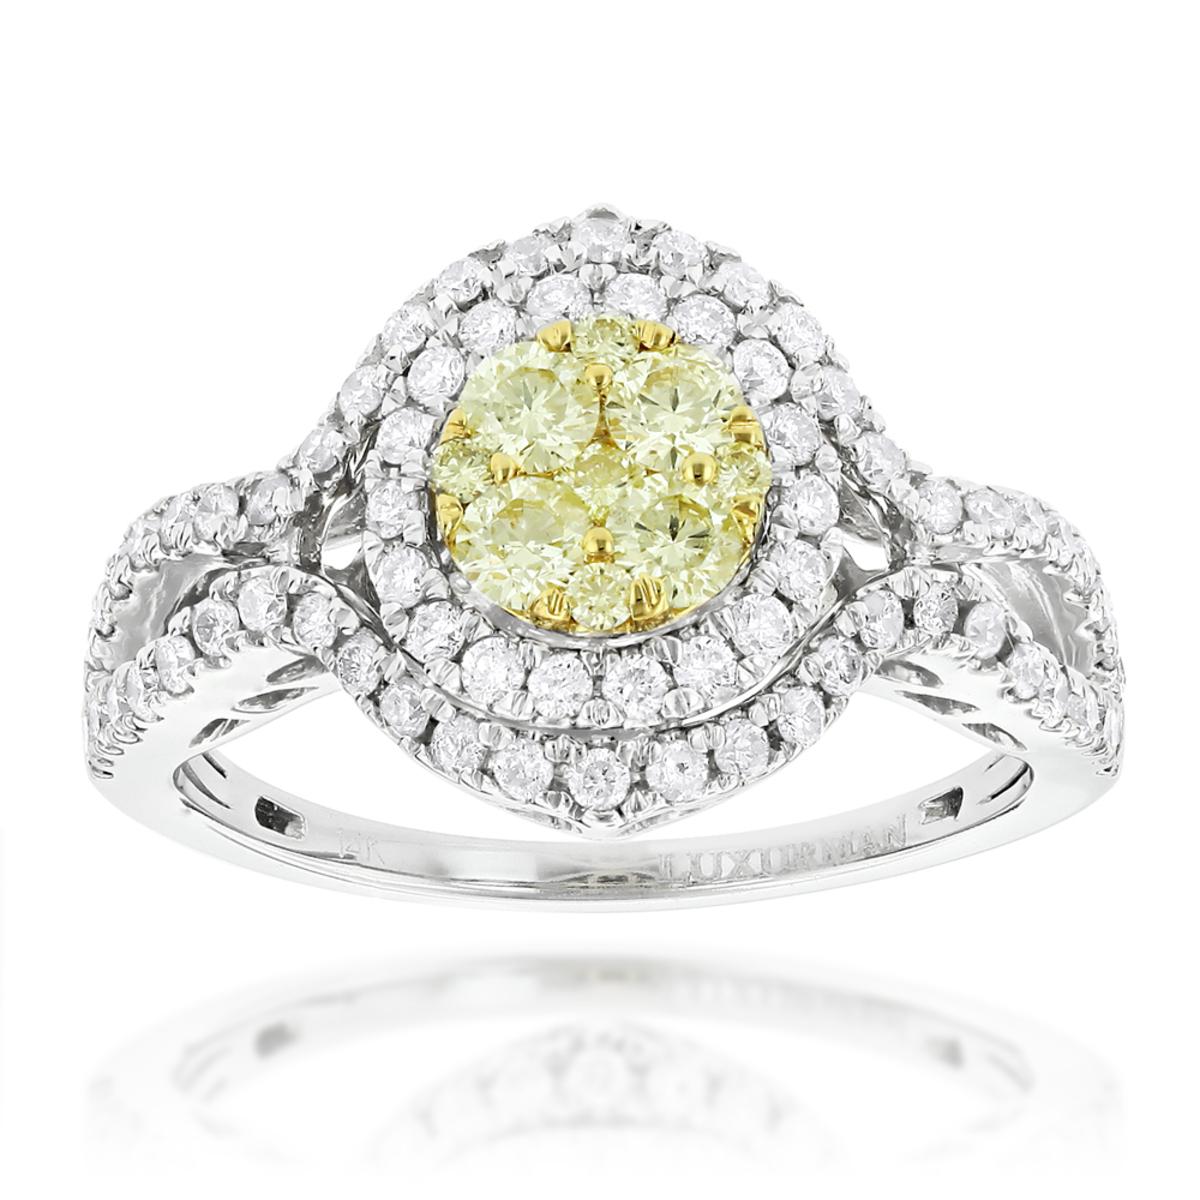 Women's Cluster Rings: 14K Gold White Yellow Diamond Engagement Ring 1.15ct